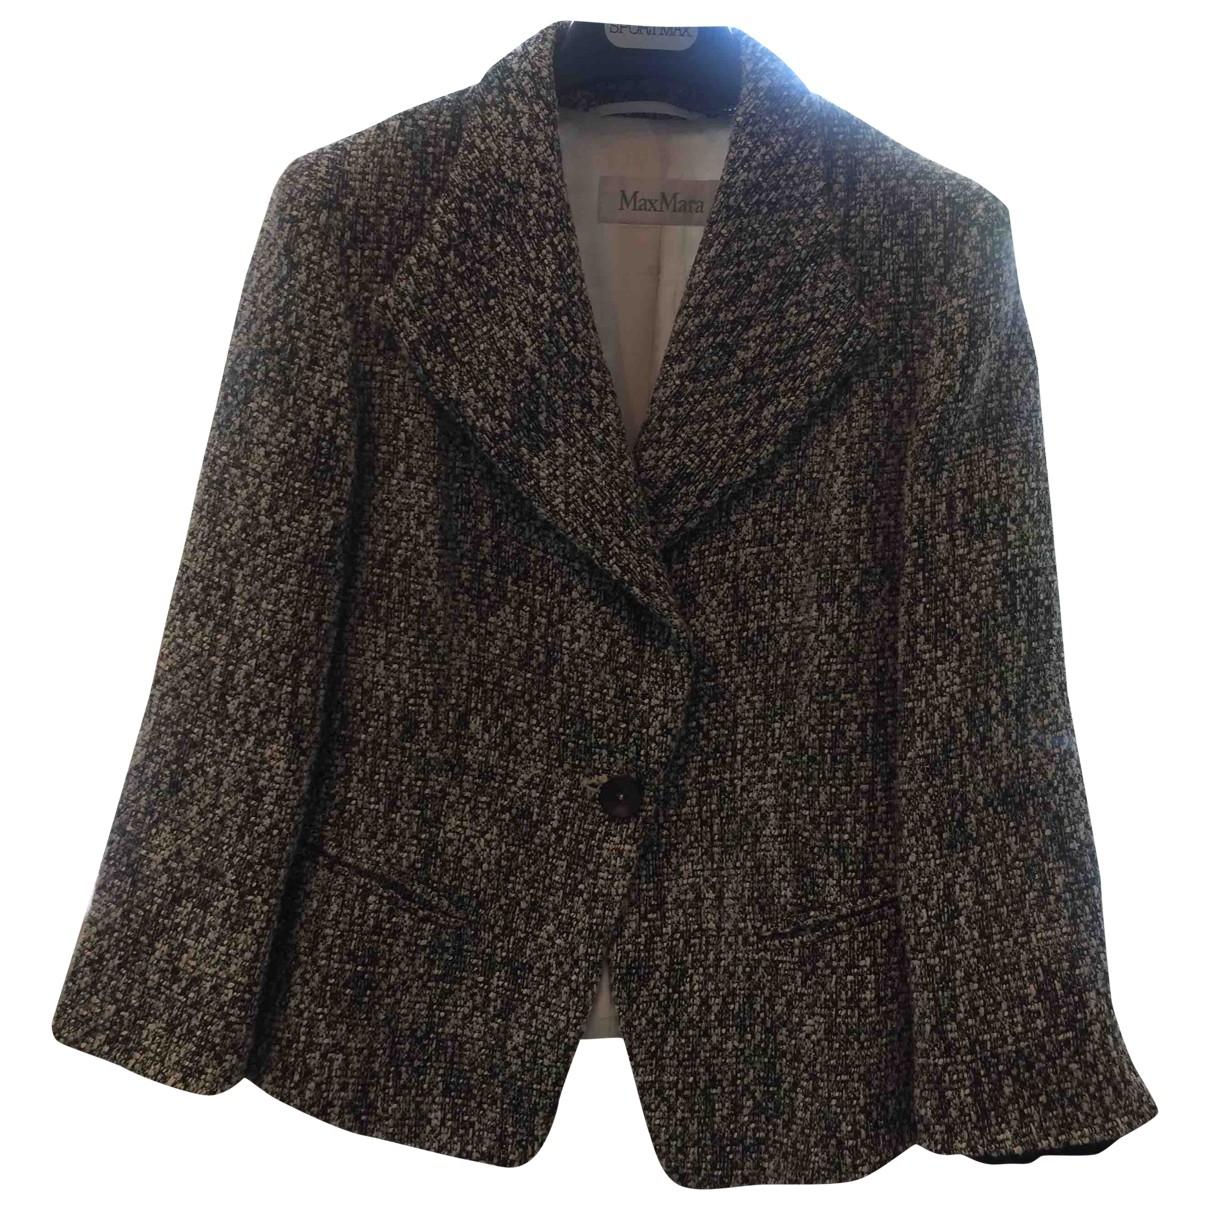 Max Mara \N Brown Cotton jacket for Women 40 IT